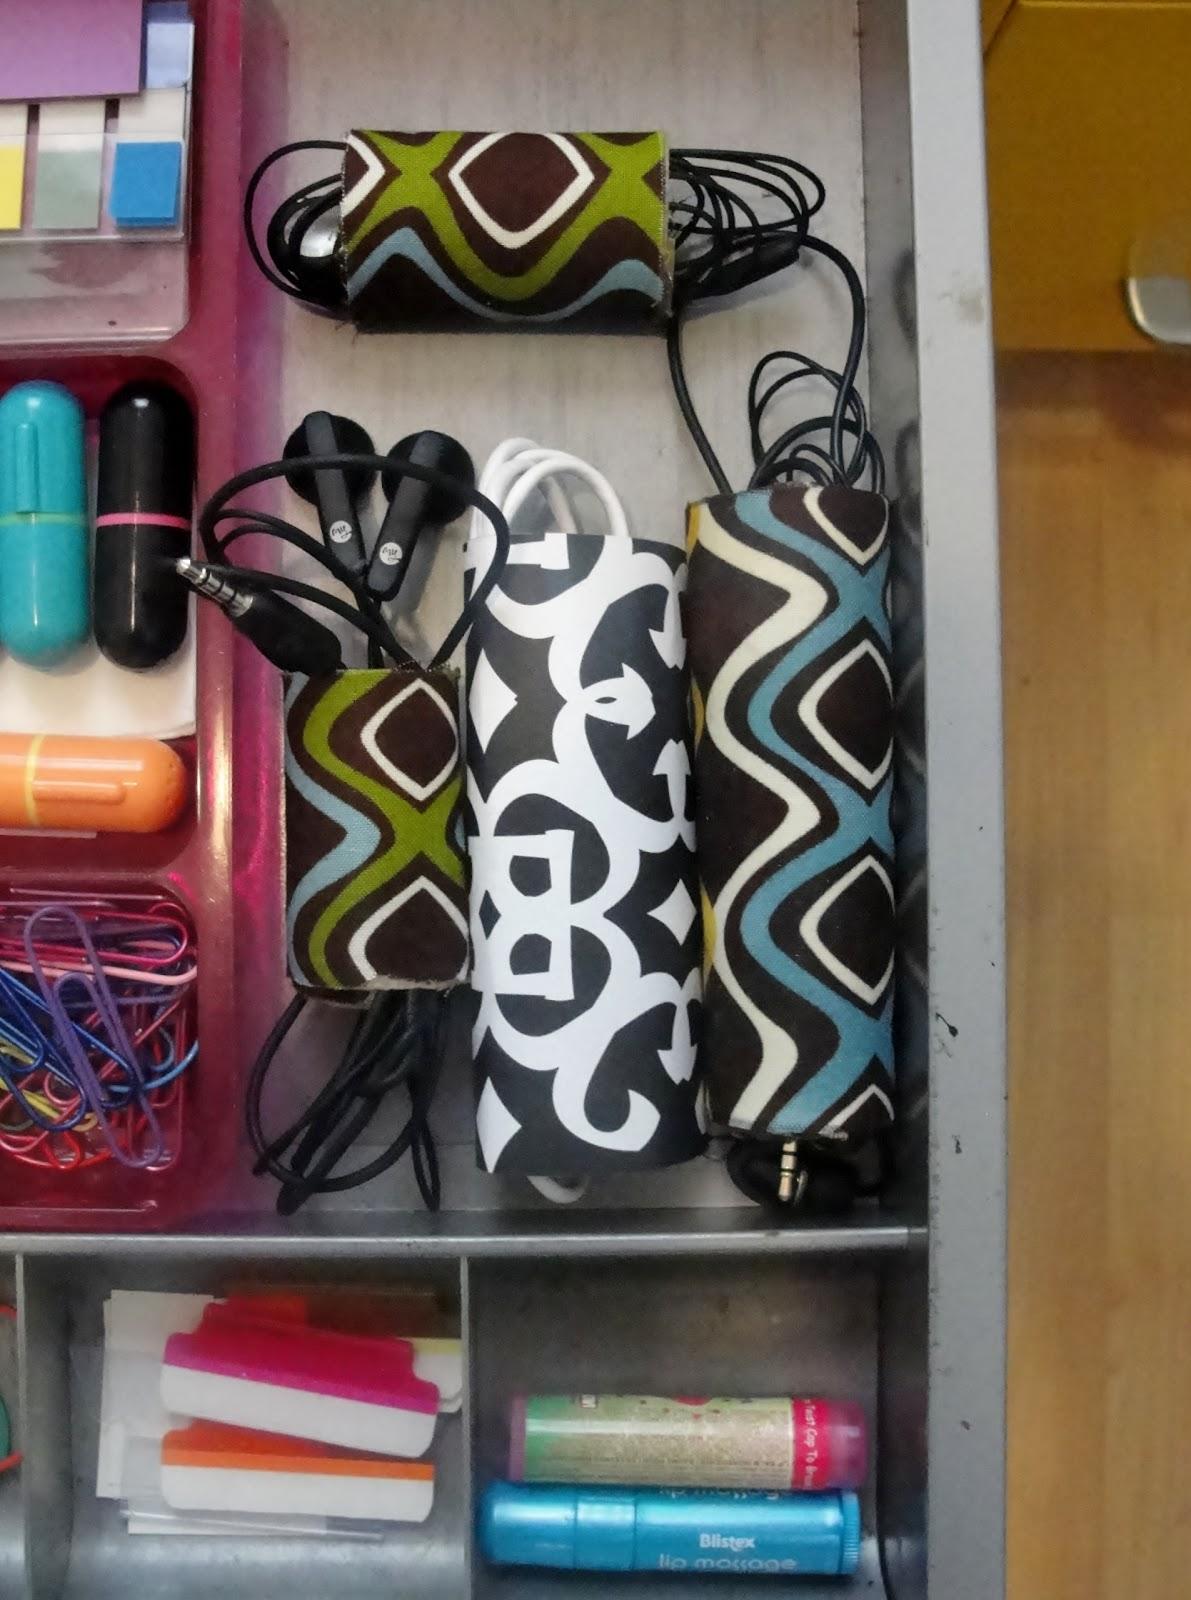 Easy DIY cord organizer